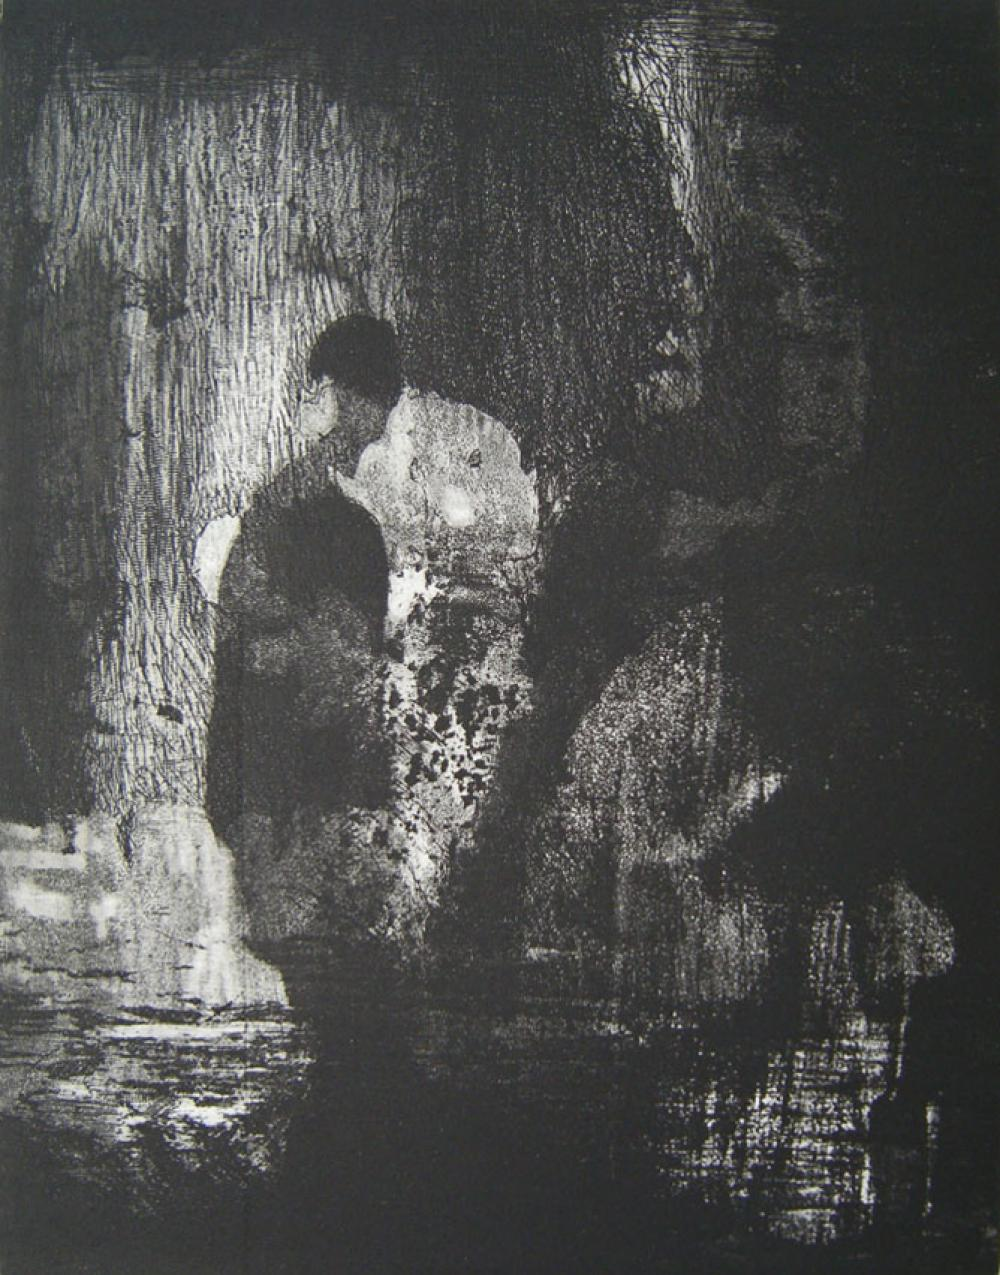 Léthé - The river of oblivion